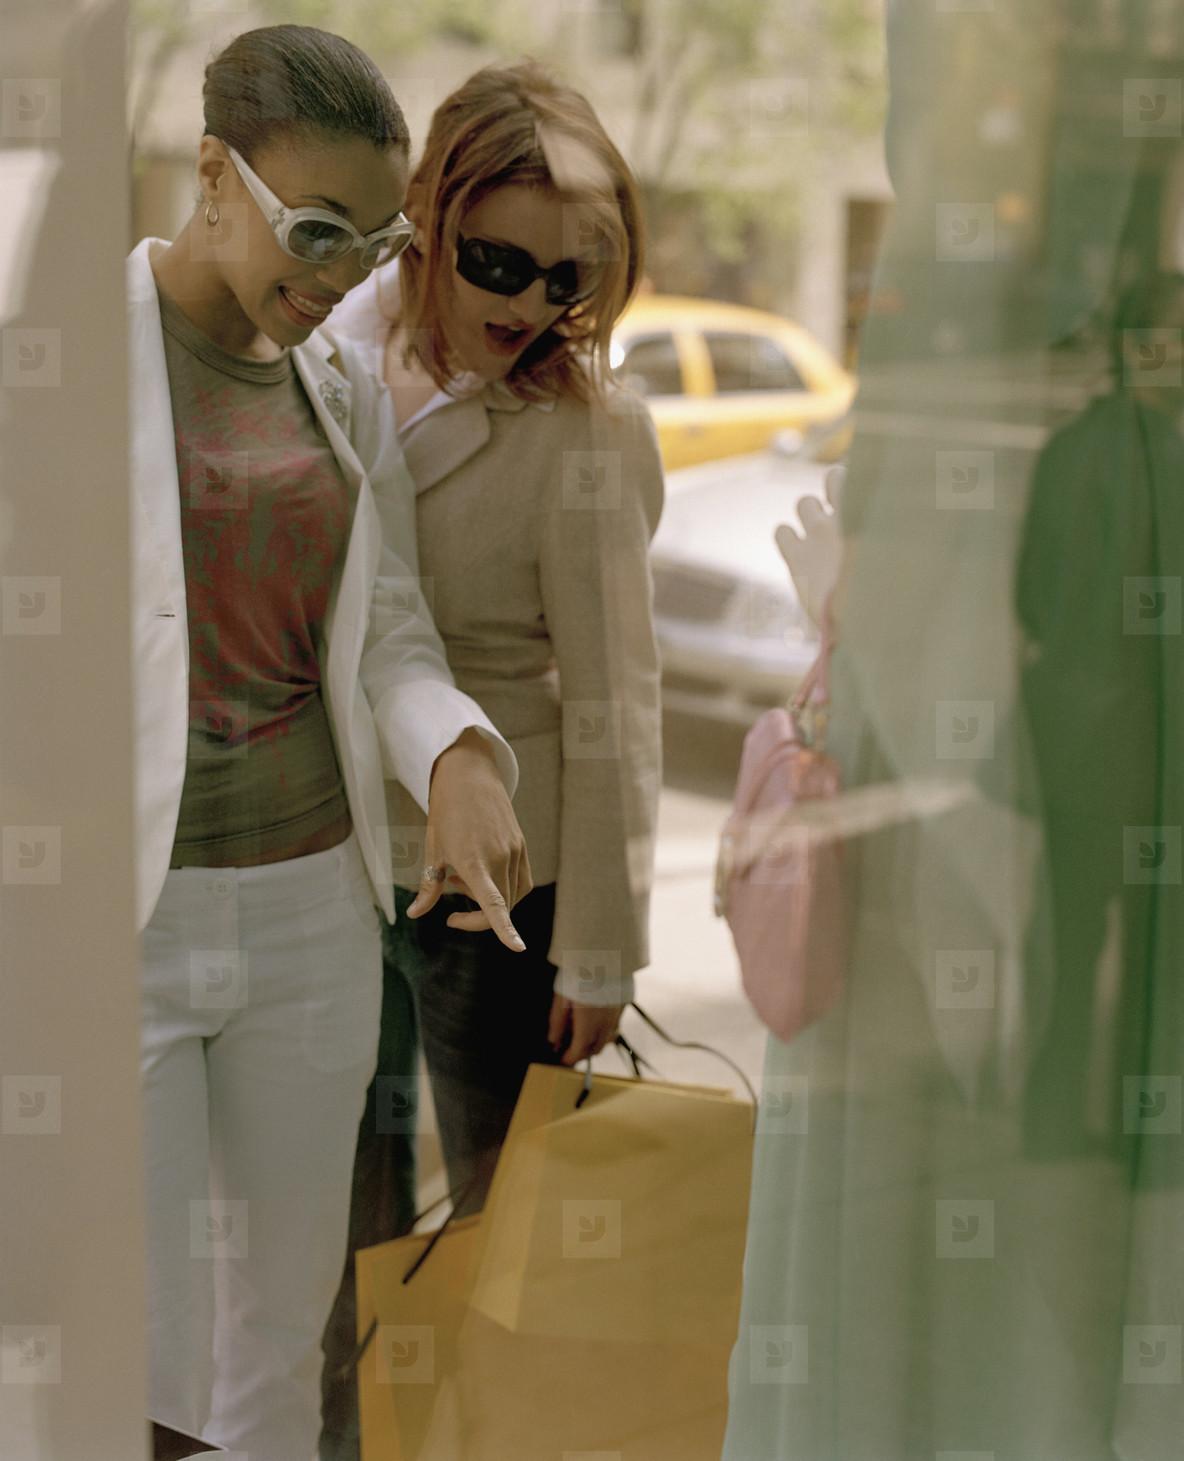 NYC Girlfriends Shopping  06